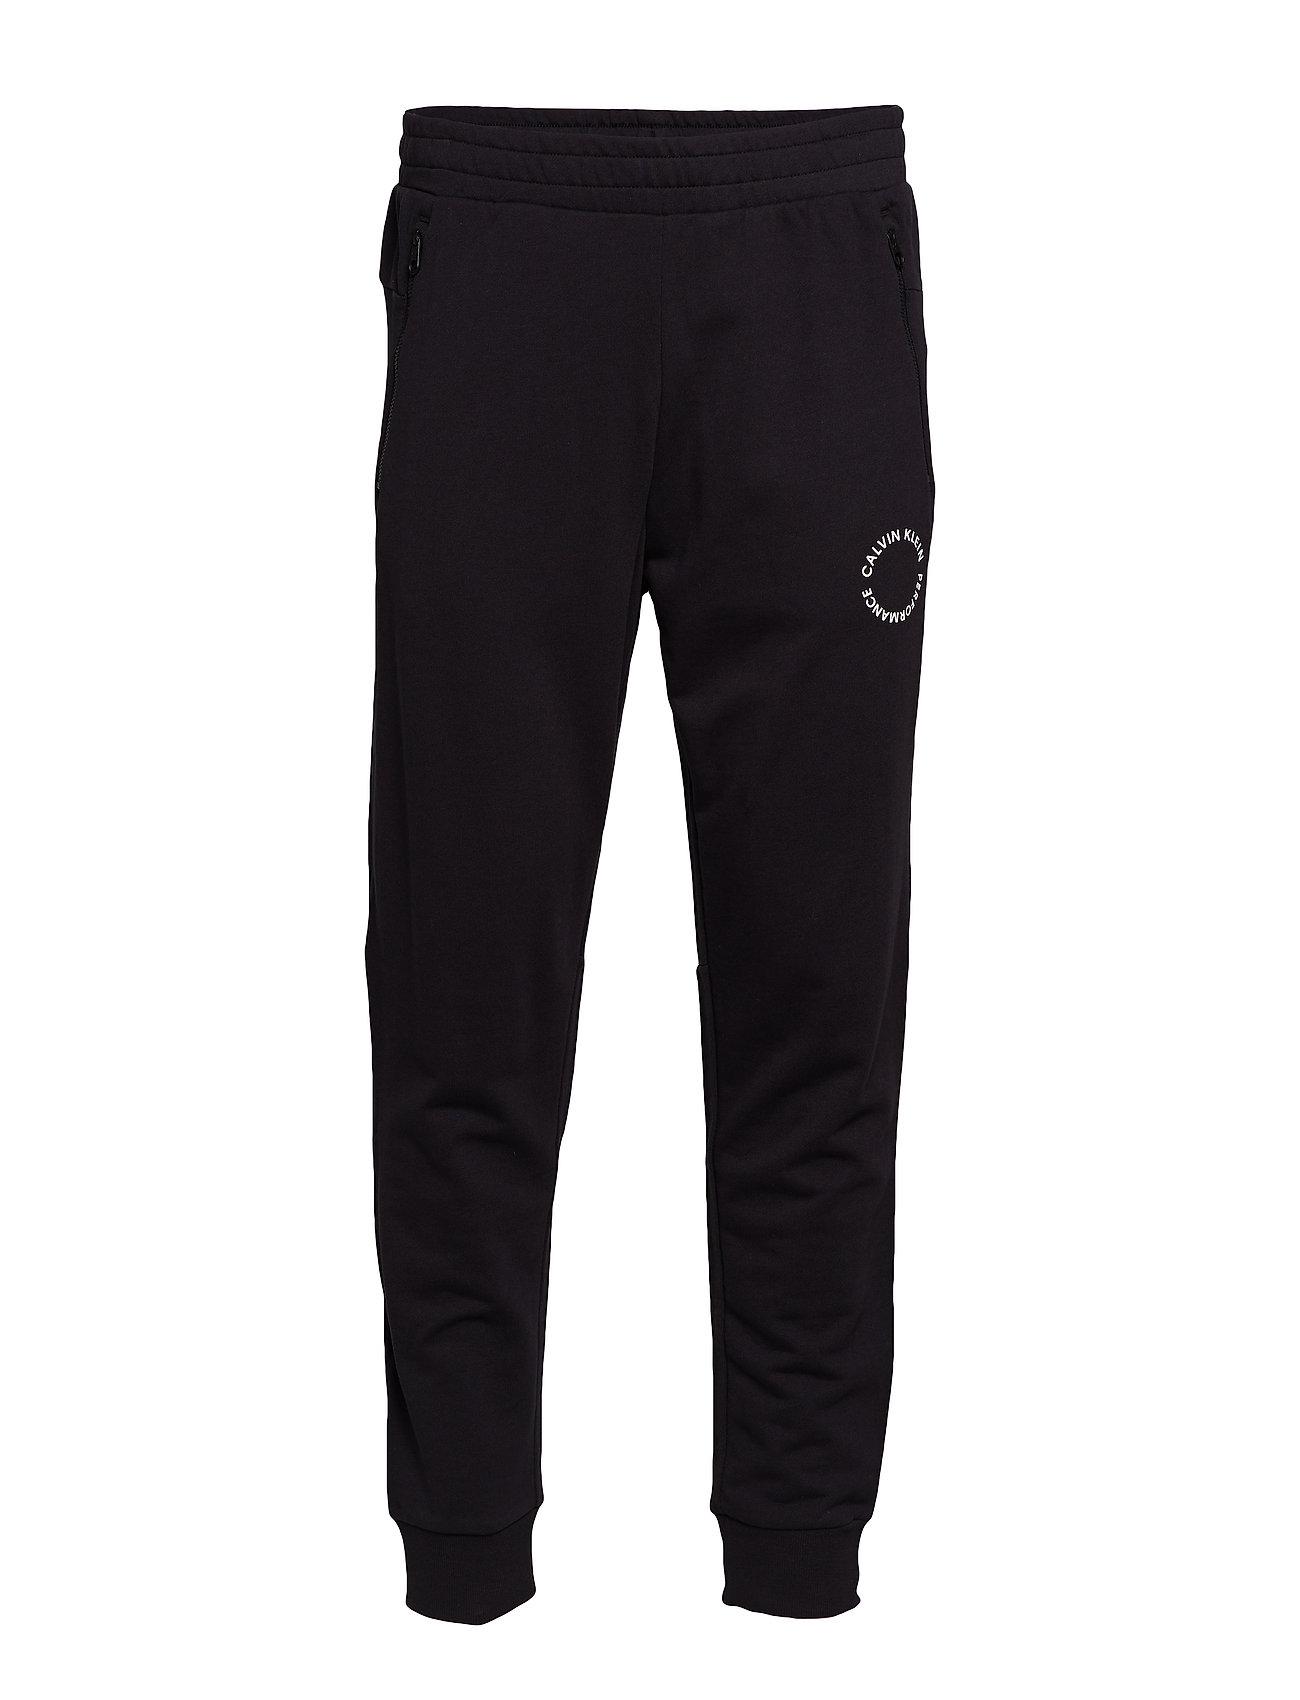 Calvin Klein Performance TRACK PANTS - CK BLACK